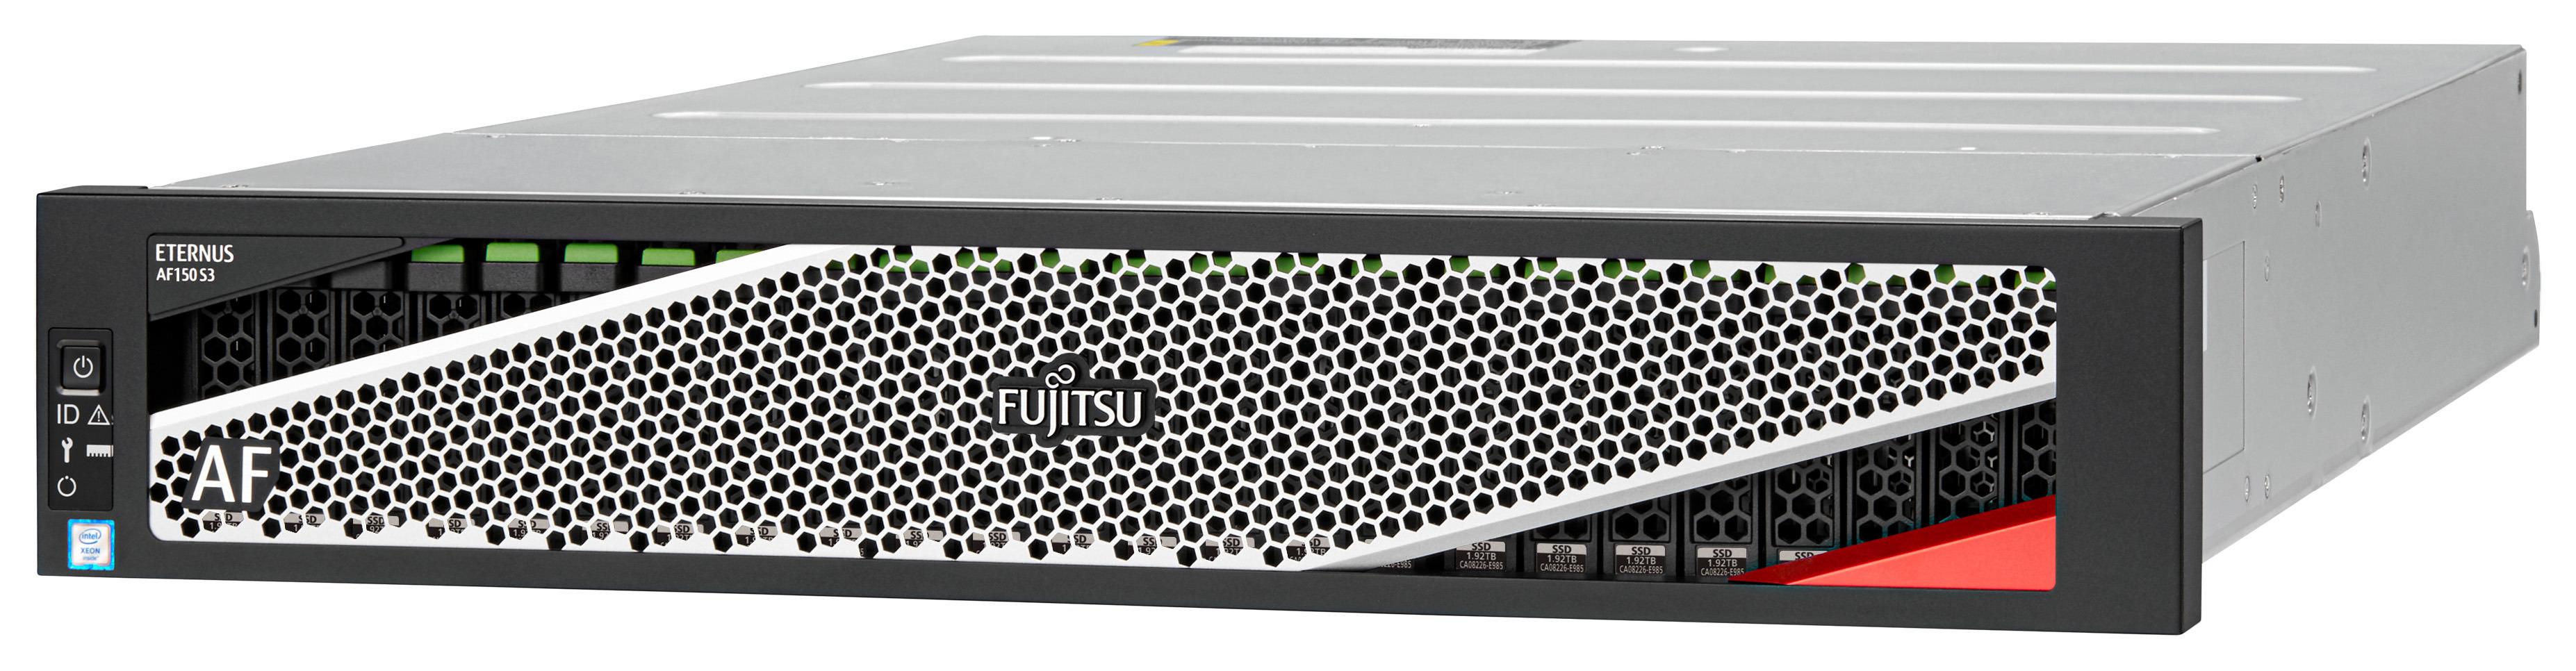 Diskovno polje Fujitsu Eternus AF150 S3